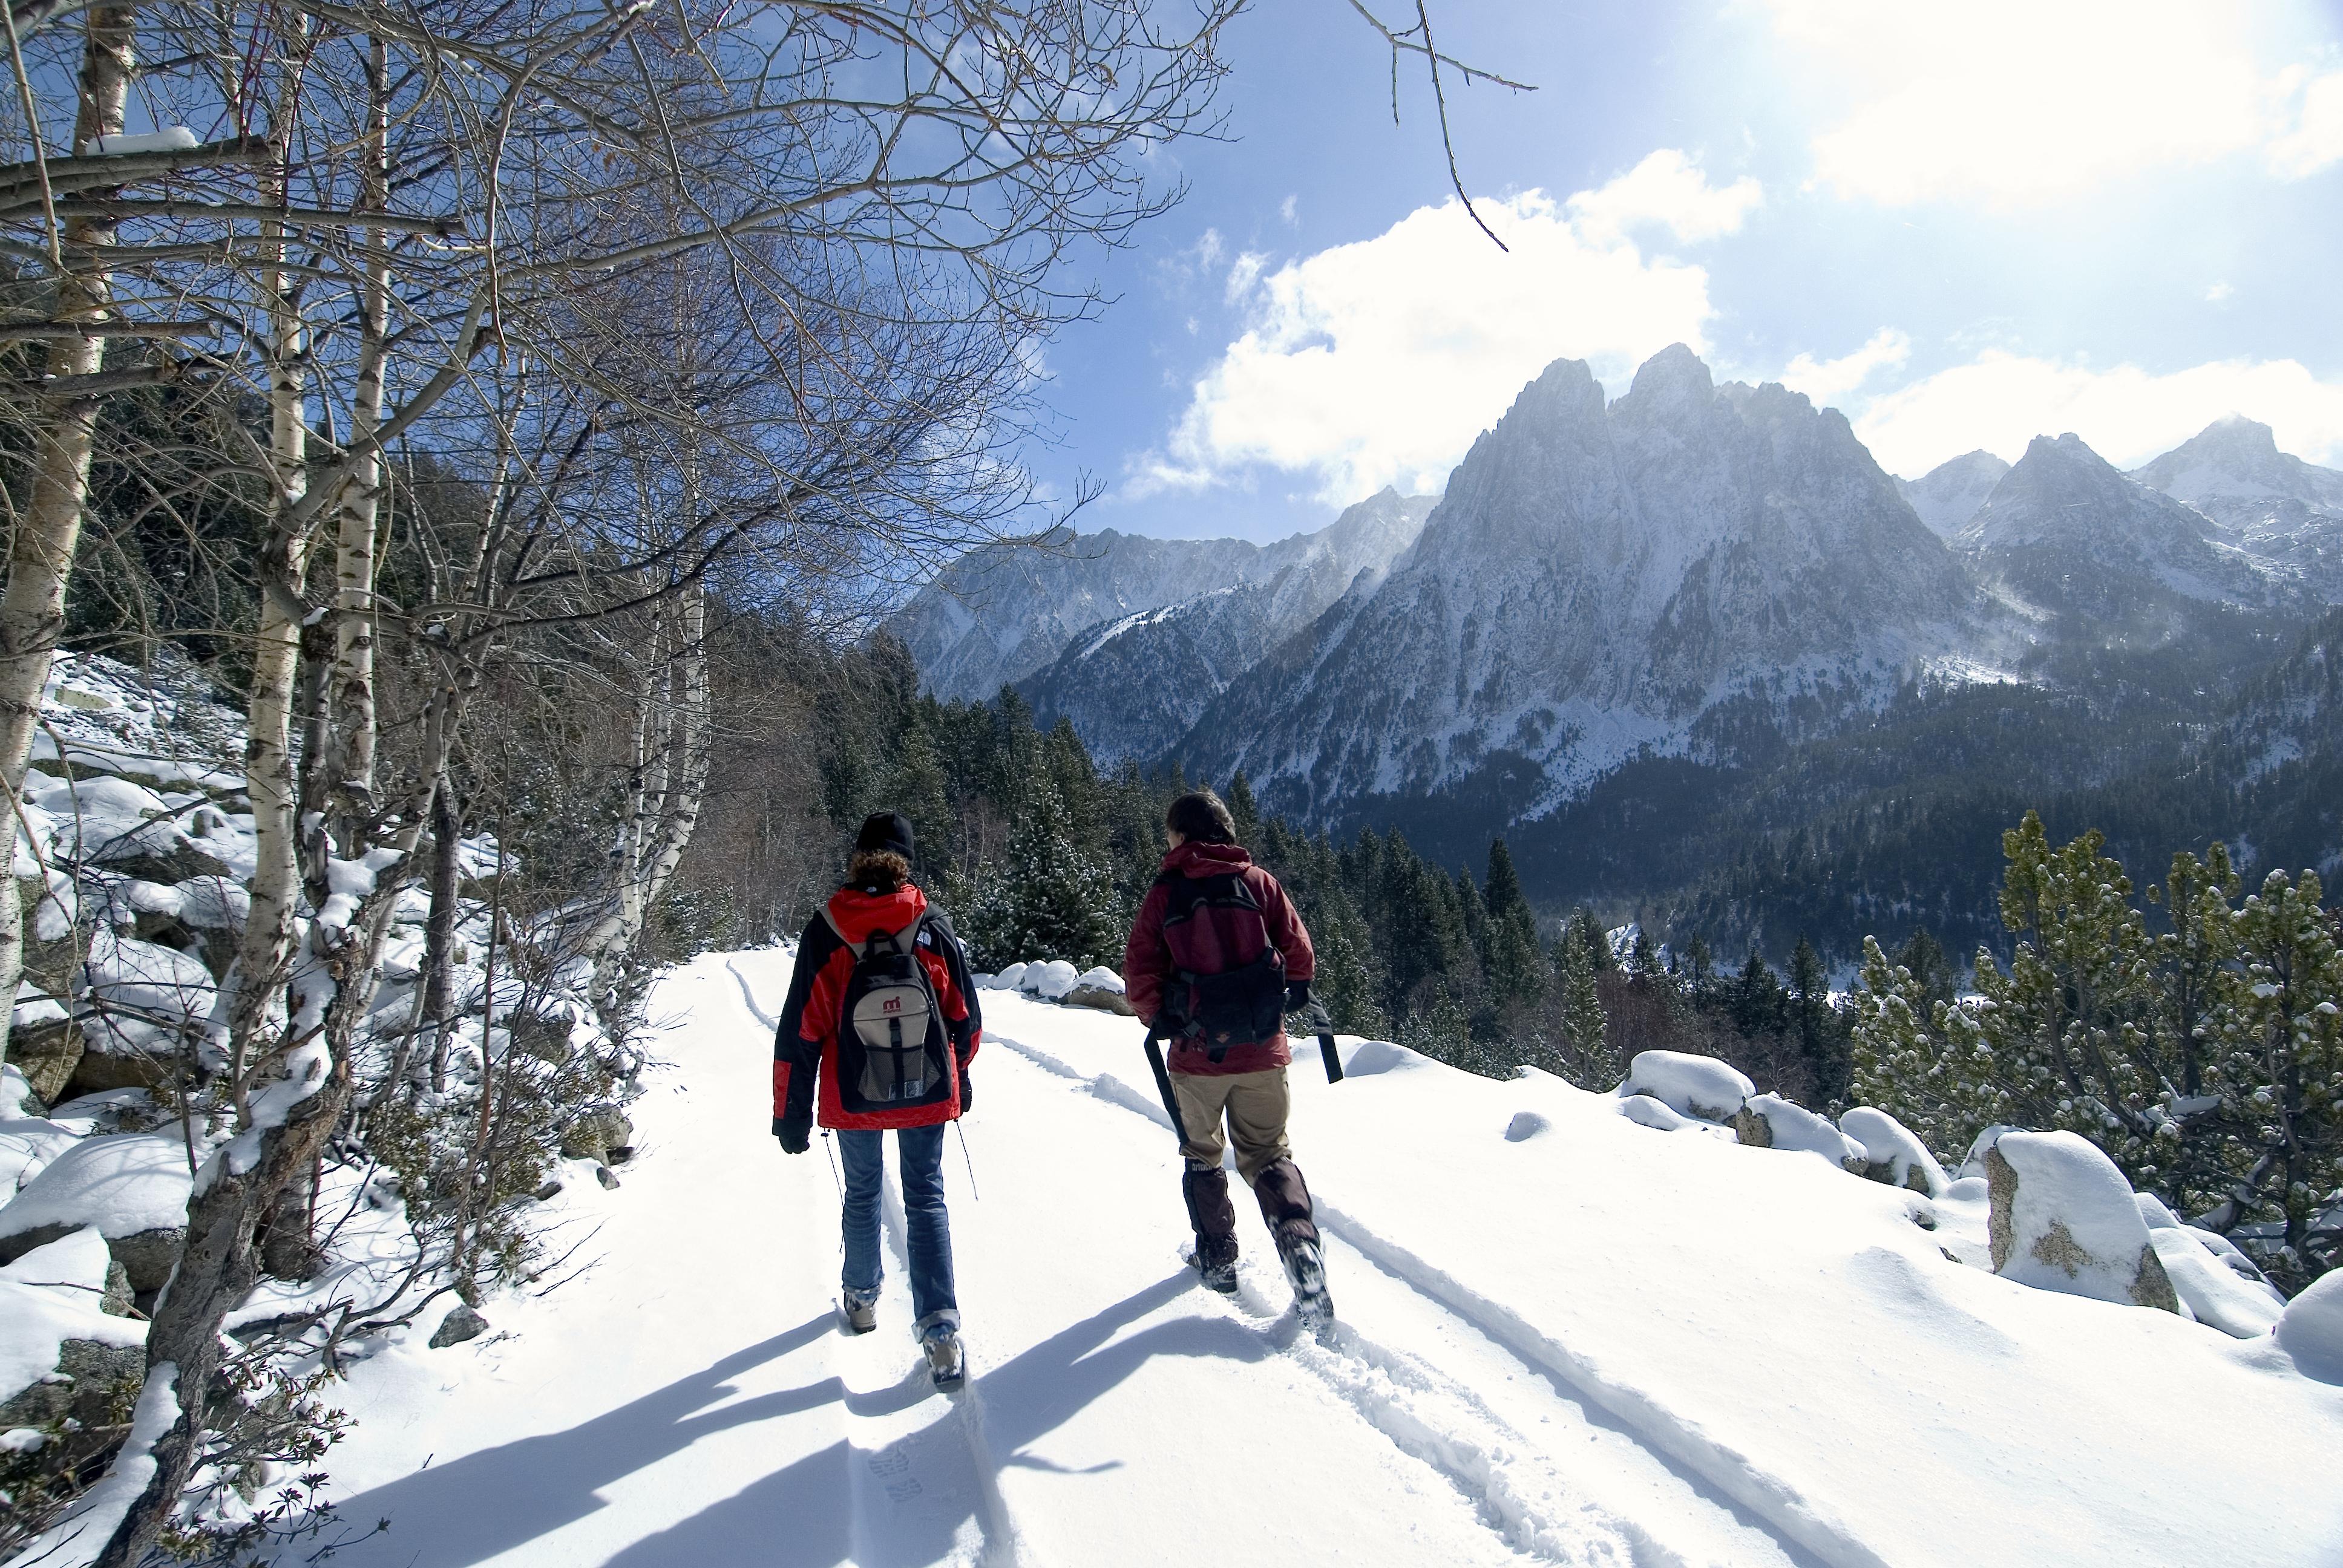 Excursió pel Parc Nacional d'Aigüestortes i Estany de Sant Maurici/Visit Pirineus